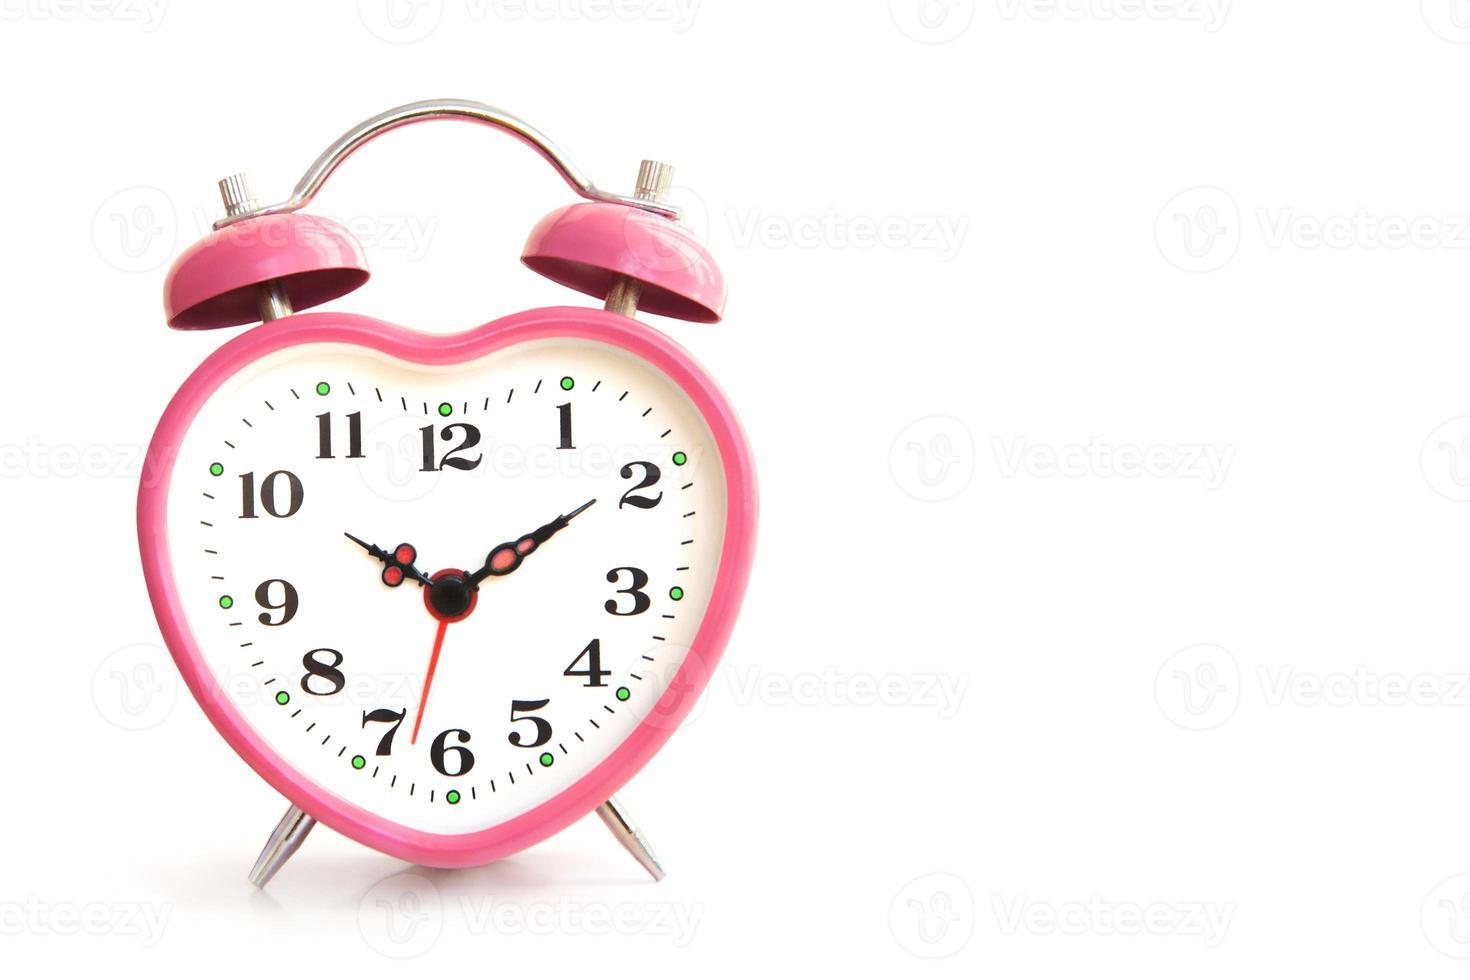 reloj despertador rosa foto